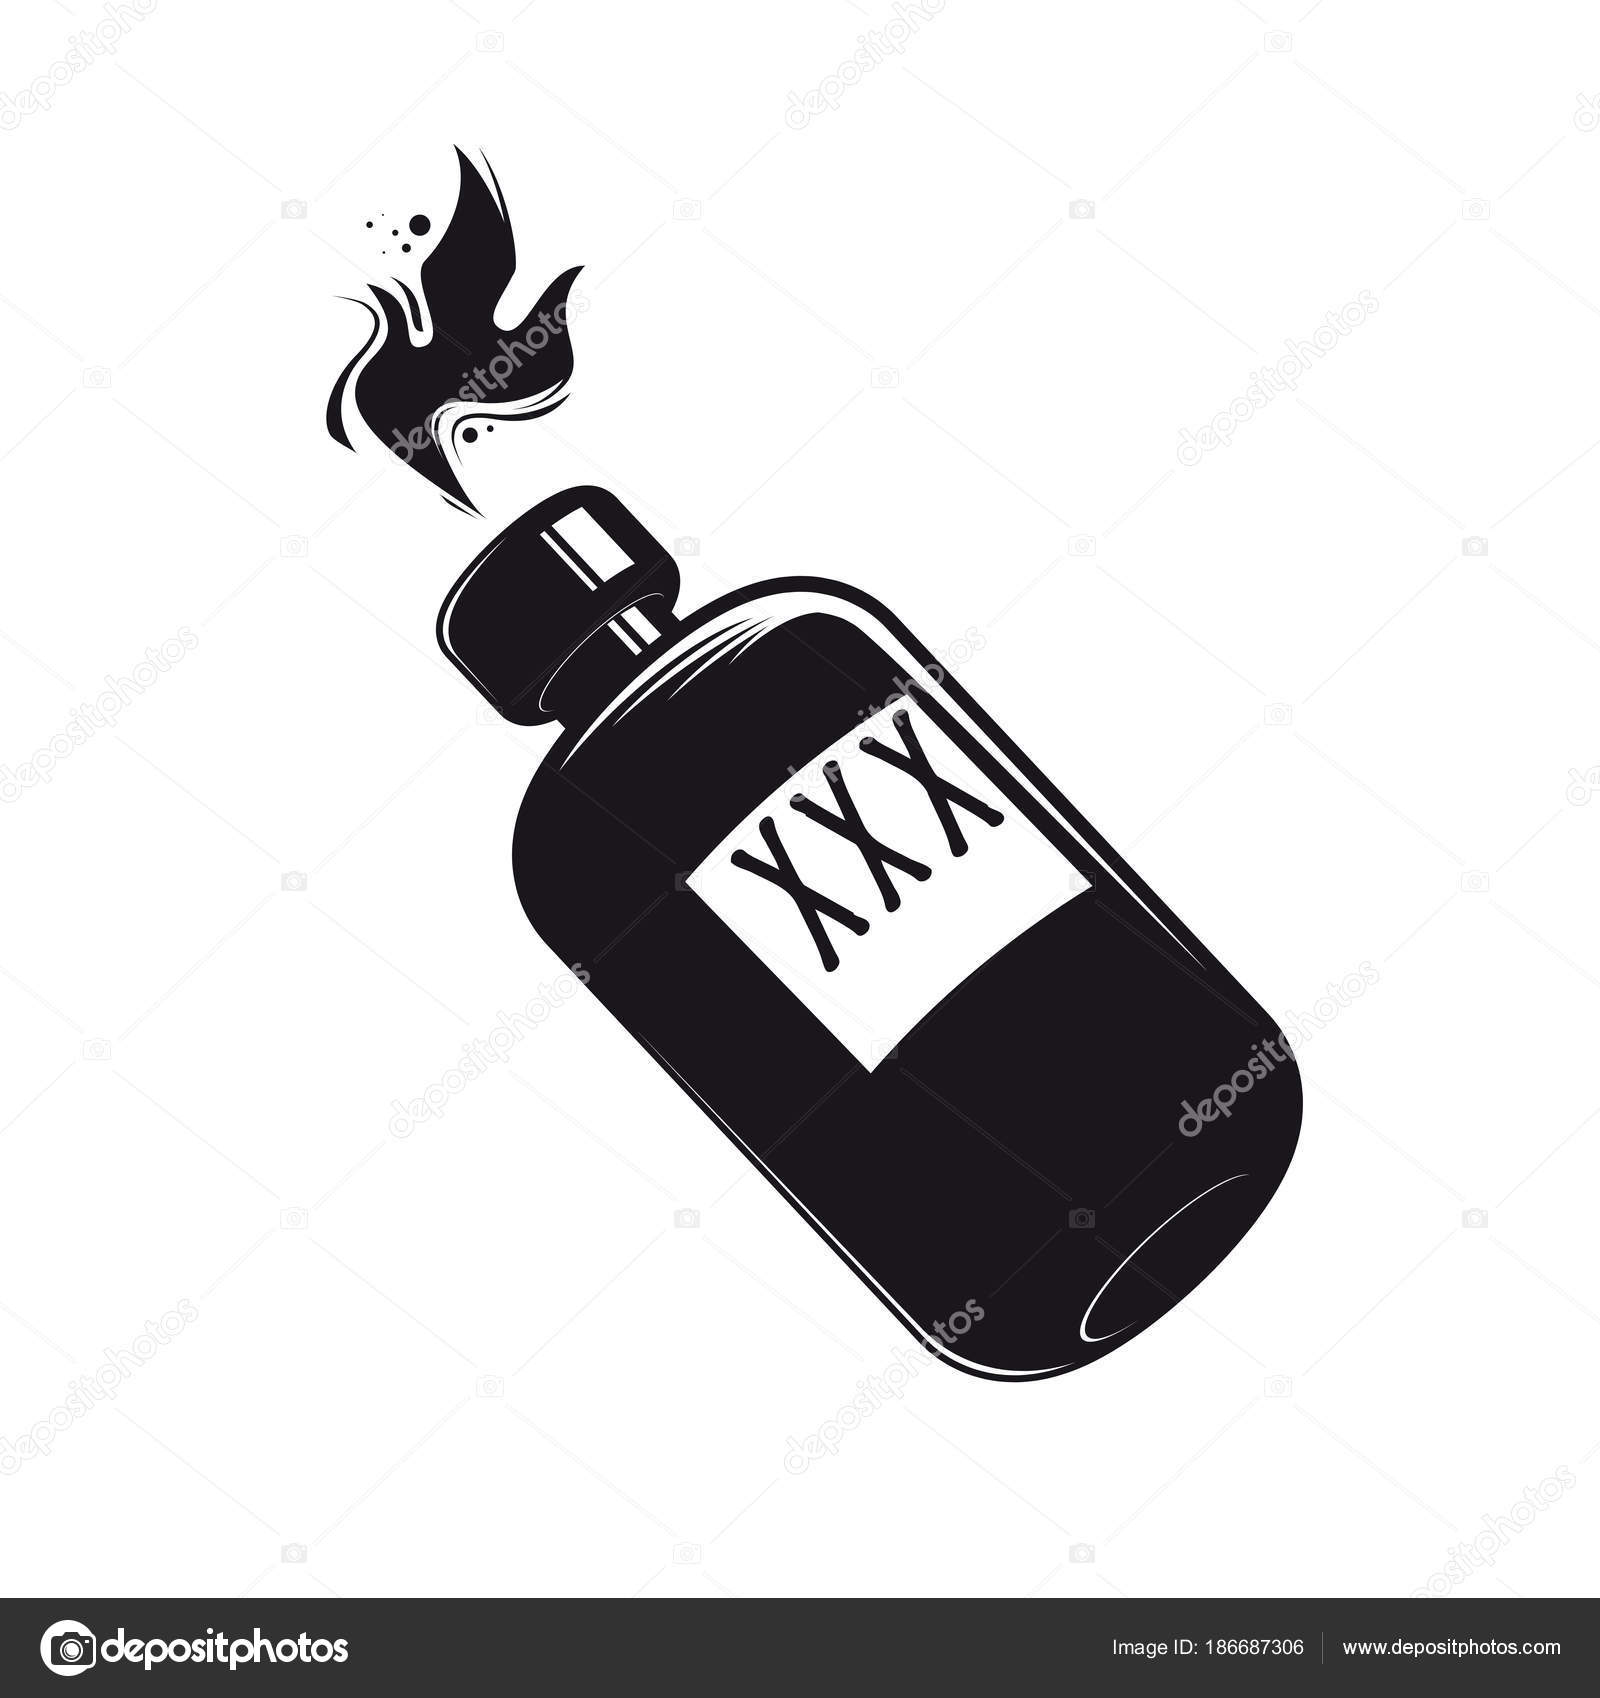 Schwarze Flasche Mit Alkohol Clipart Stockvektor Shockfactor De